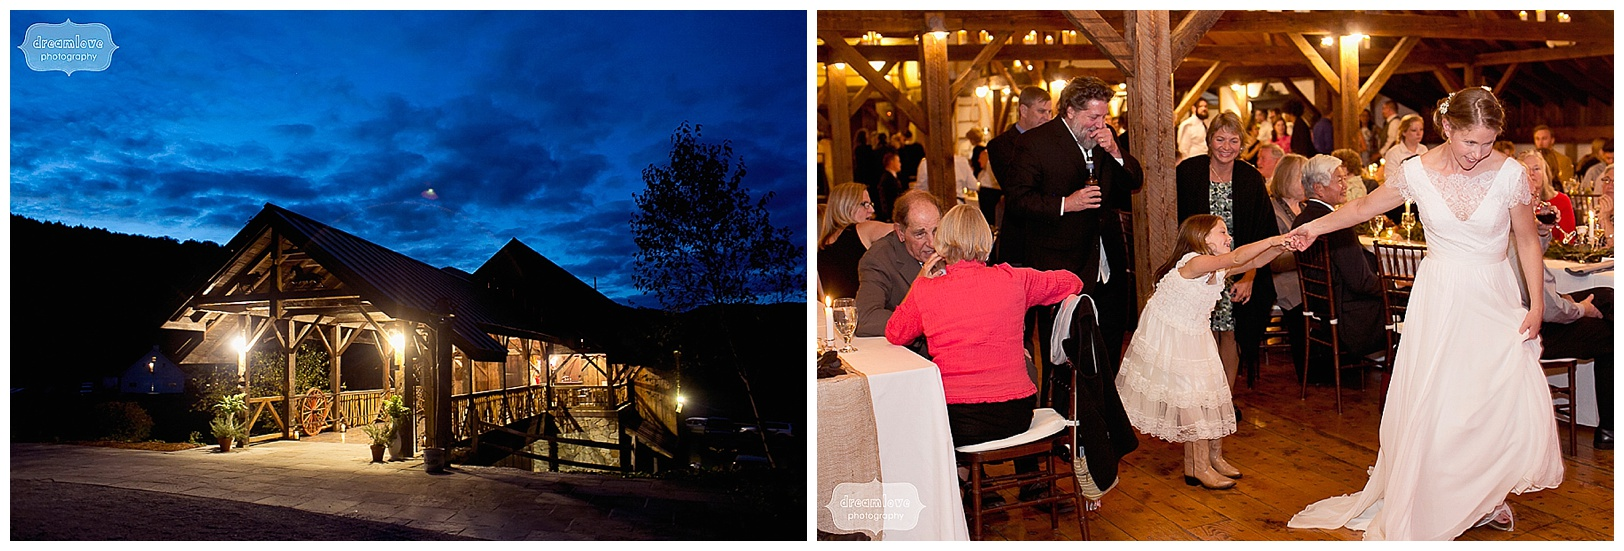 Riverside_Vermont_Wedding_Venue_0105